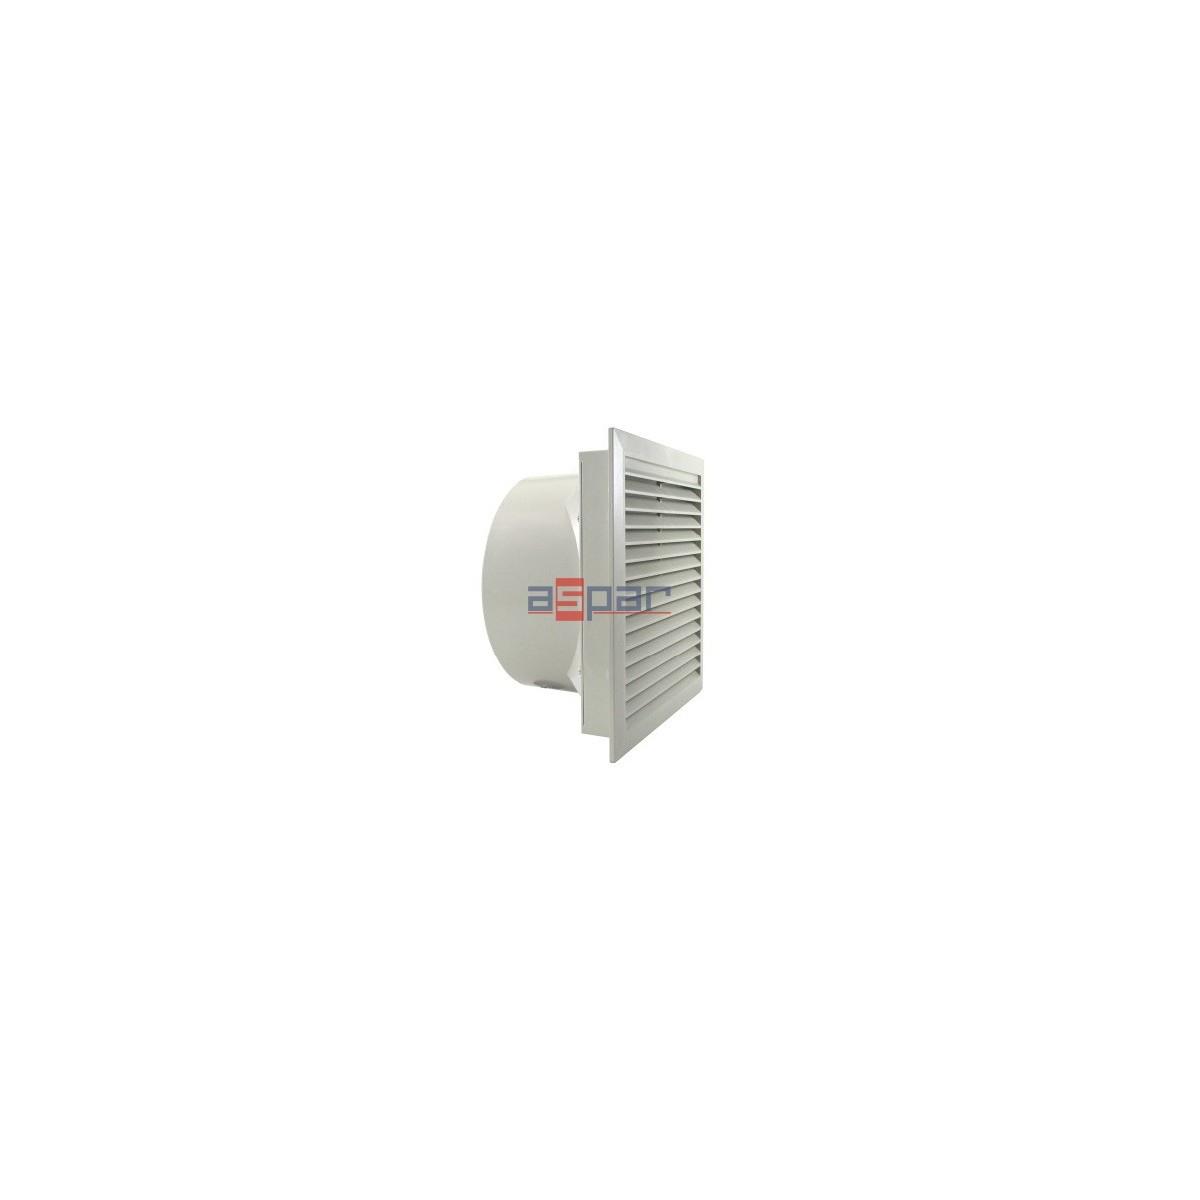 LV 500 230VAC - blowing - filter fan, 250 x 250mm